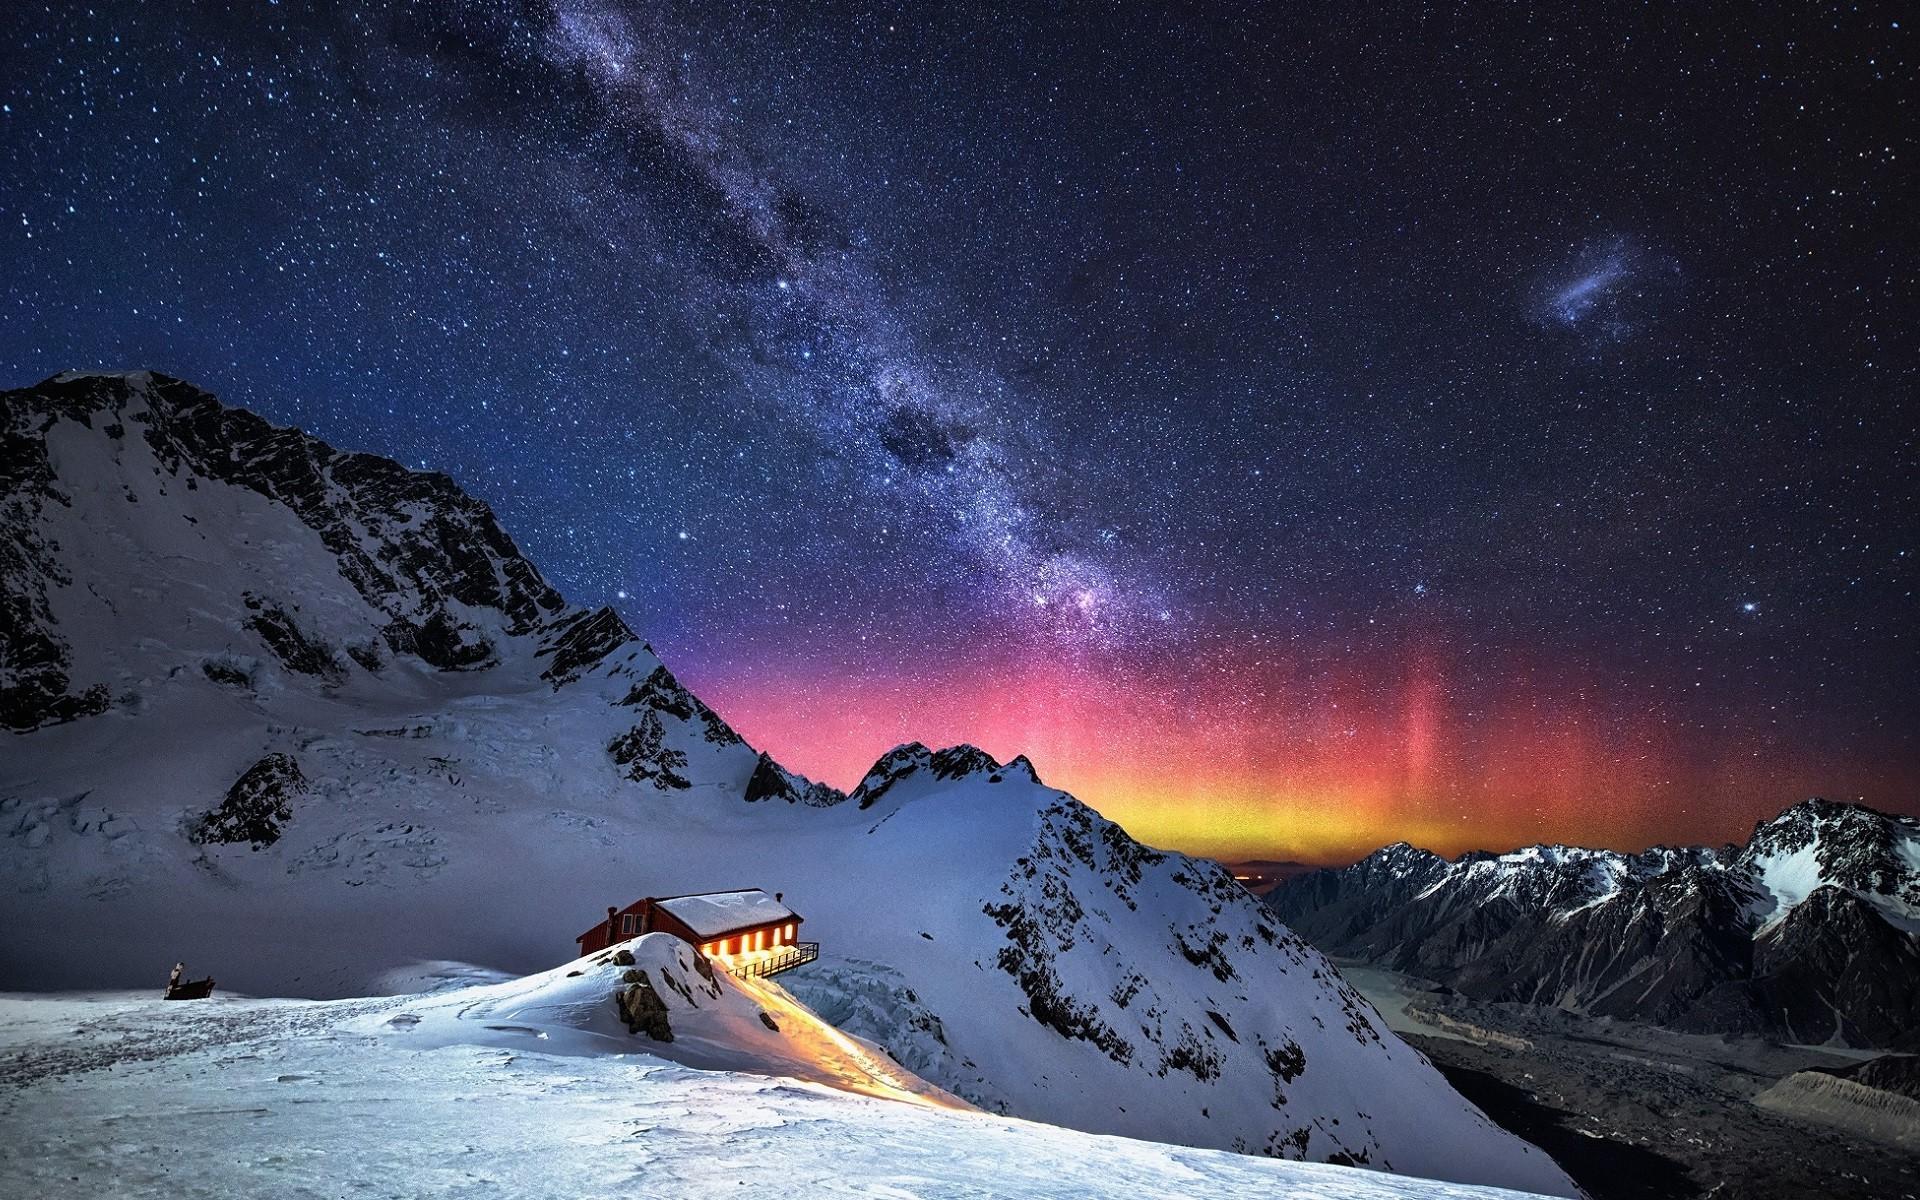 Wallpaper Landscape Night Nature Snow Stars Milky Way